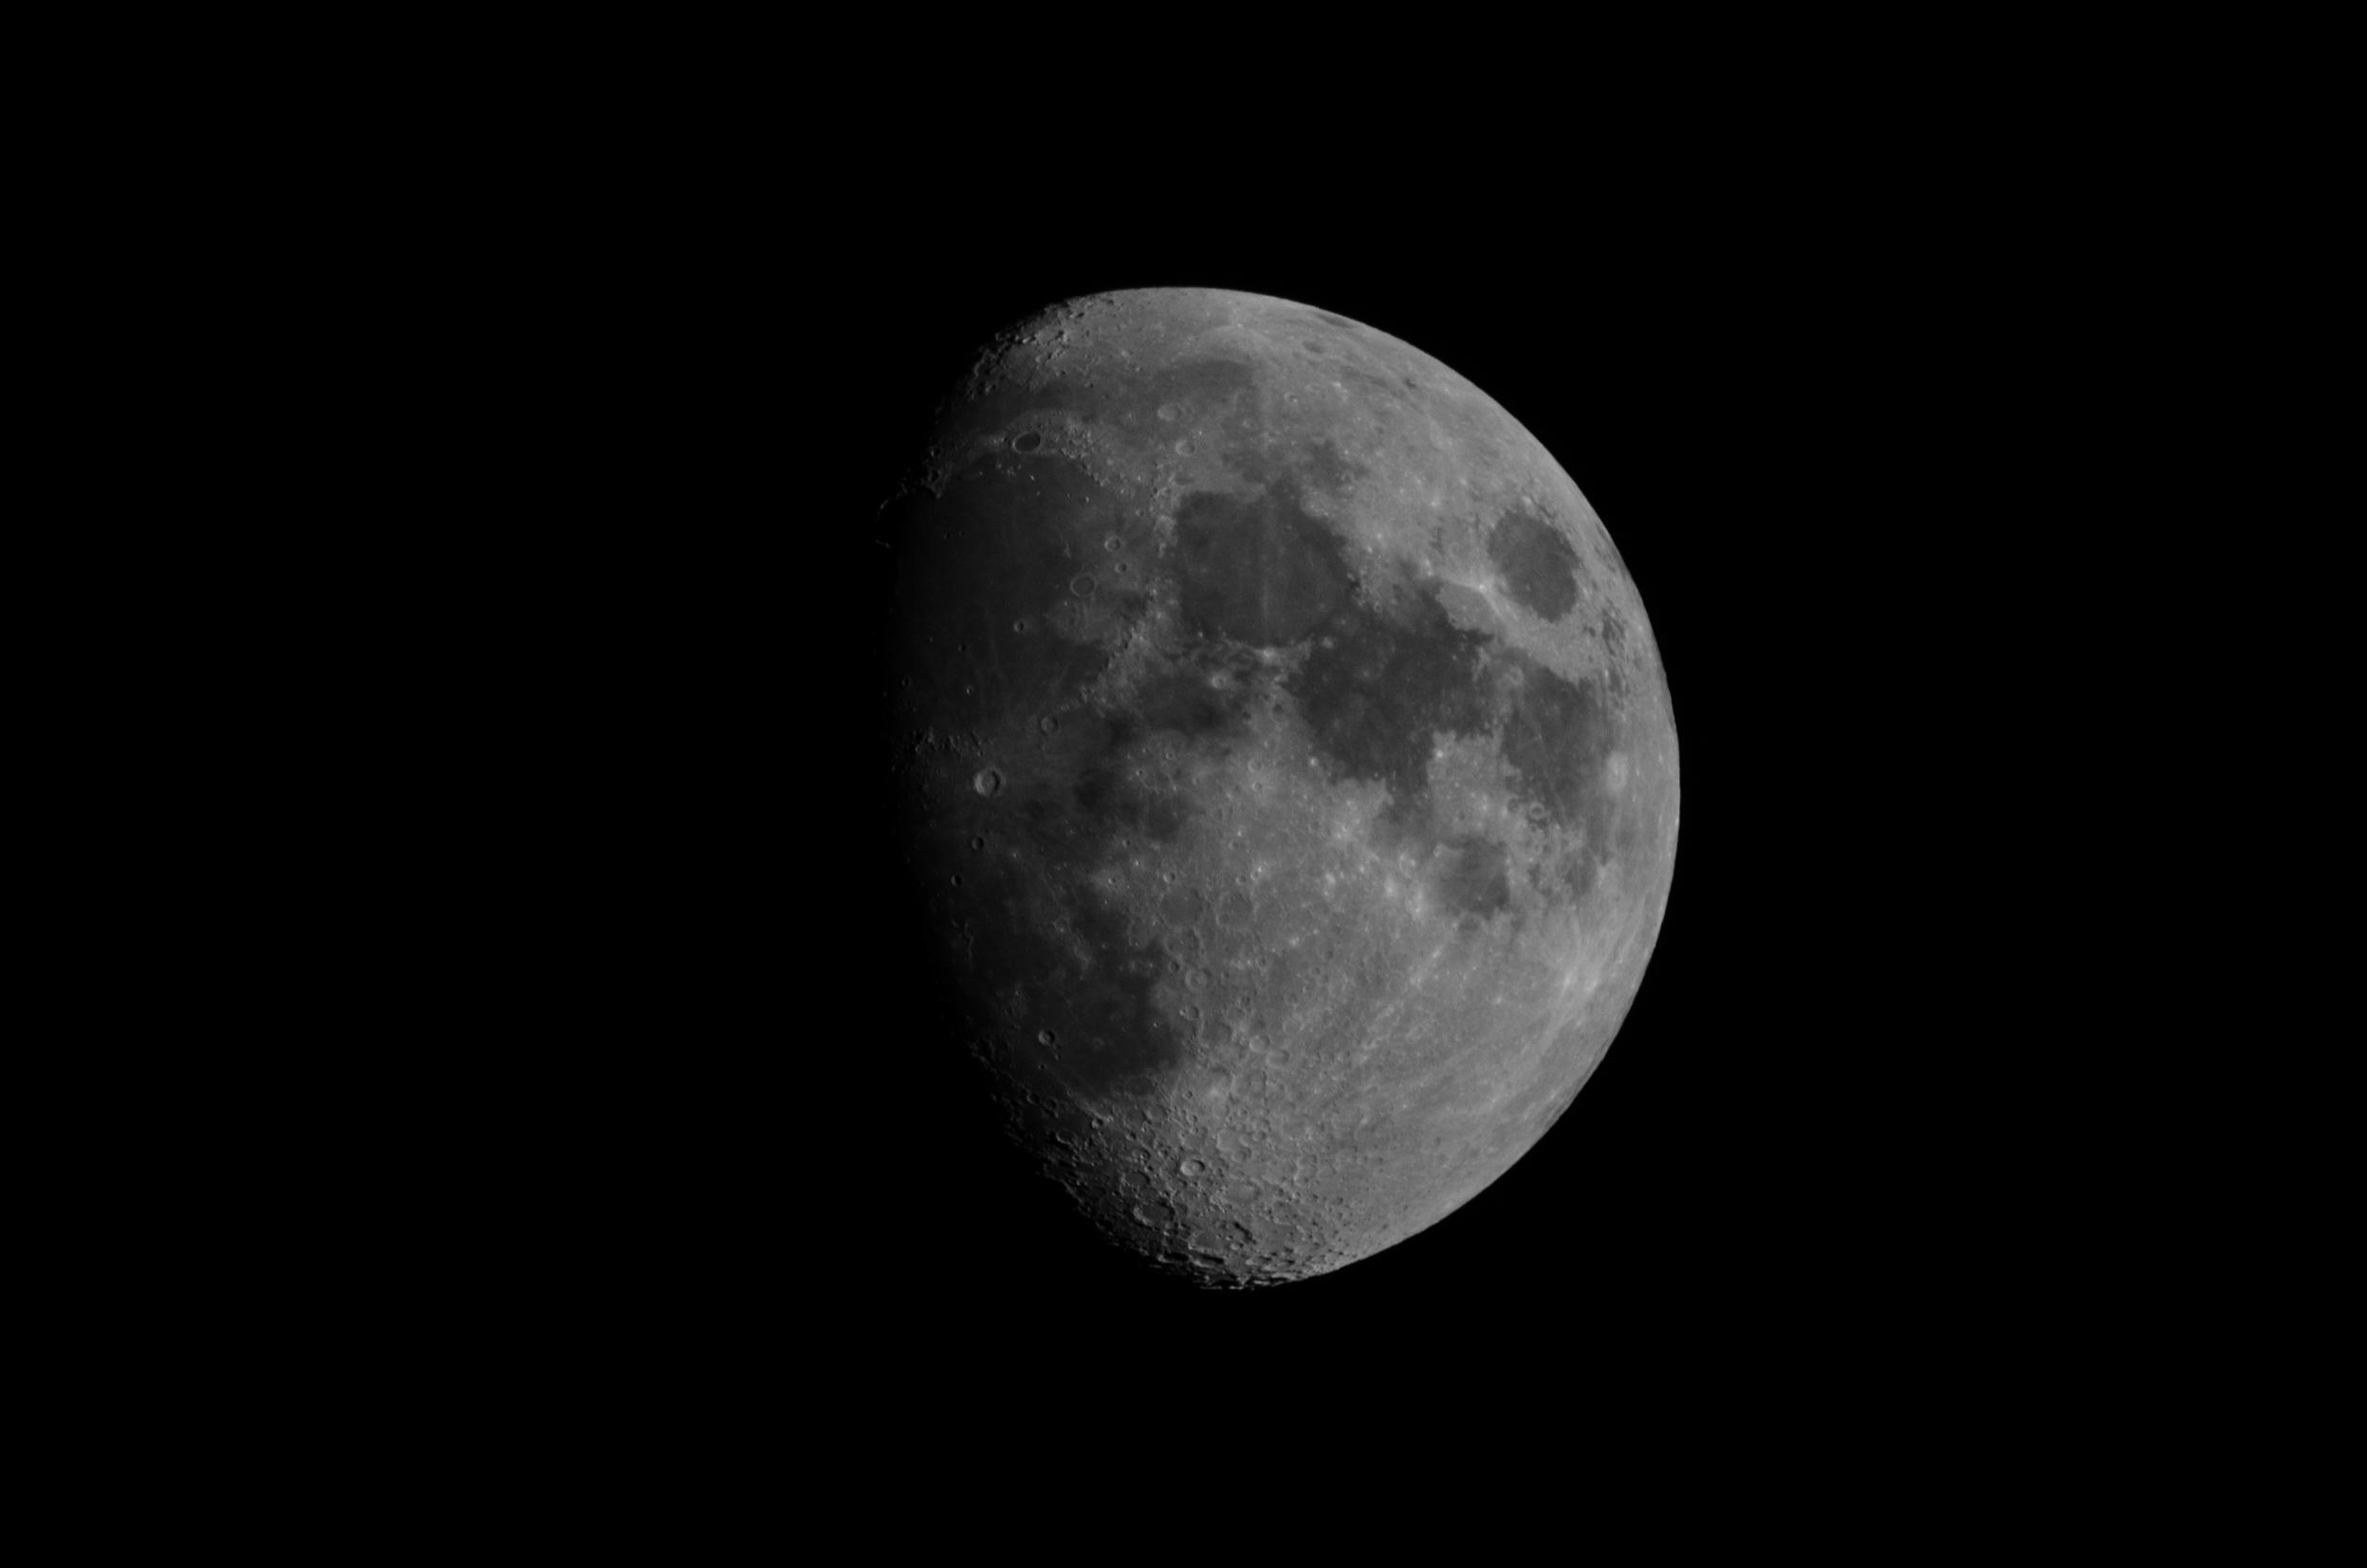 Waxing Moon  Nikon D7000 ISO 100 600mm f/10 1/400 sec